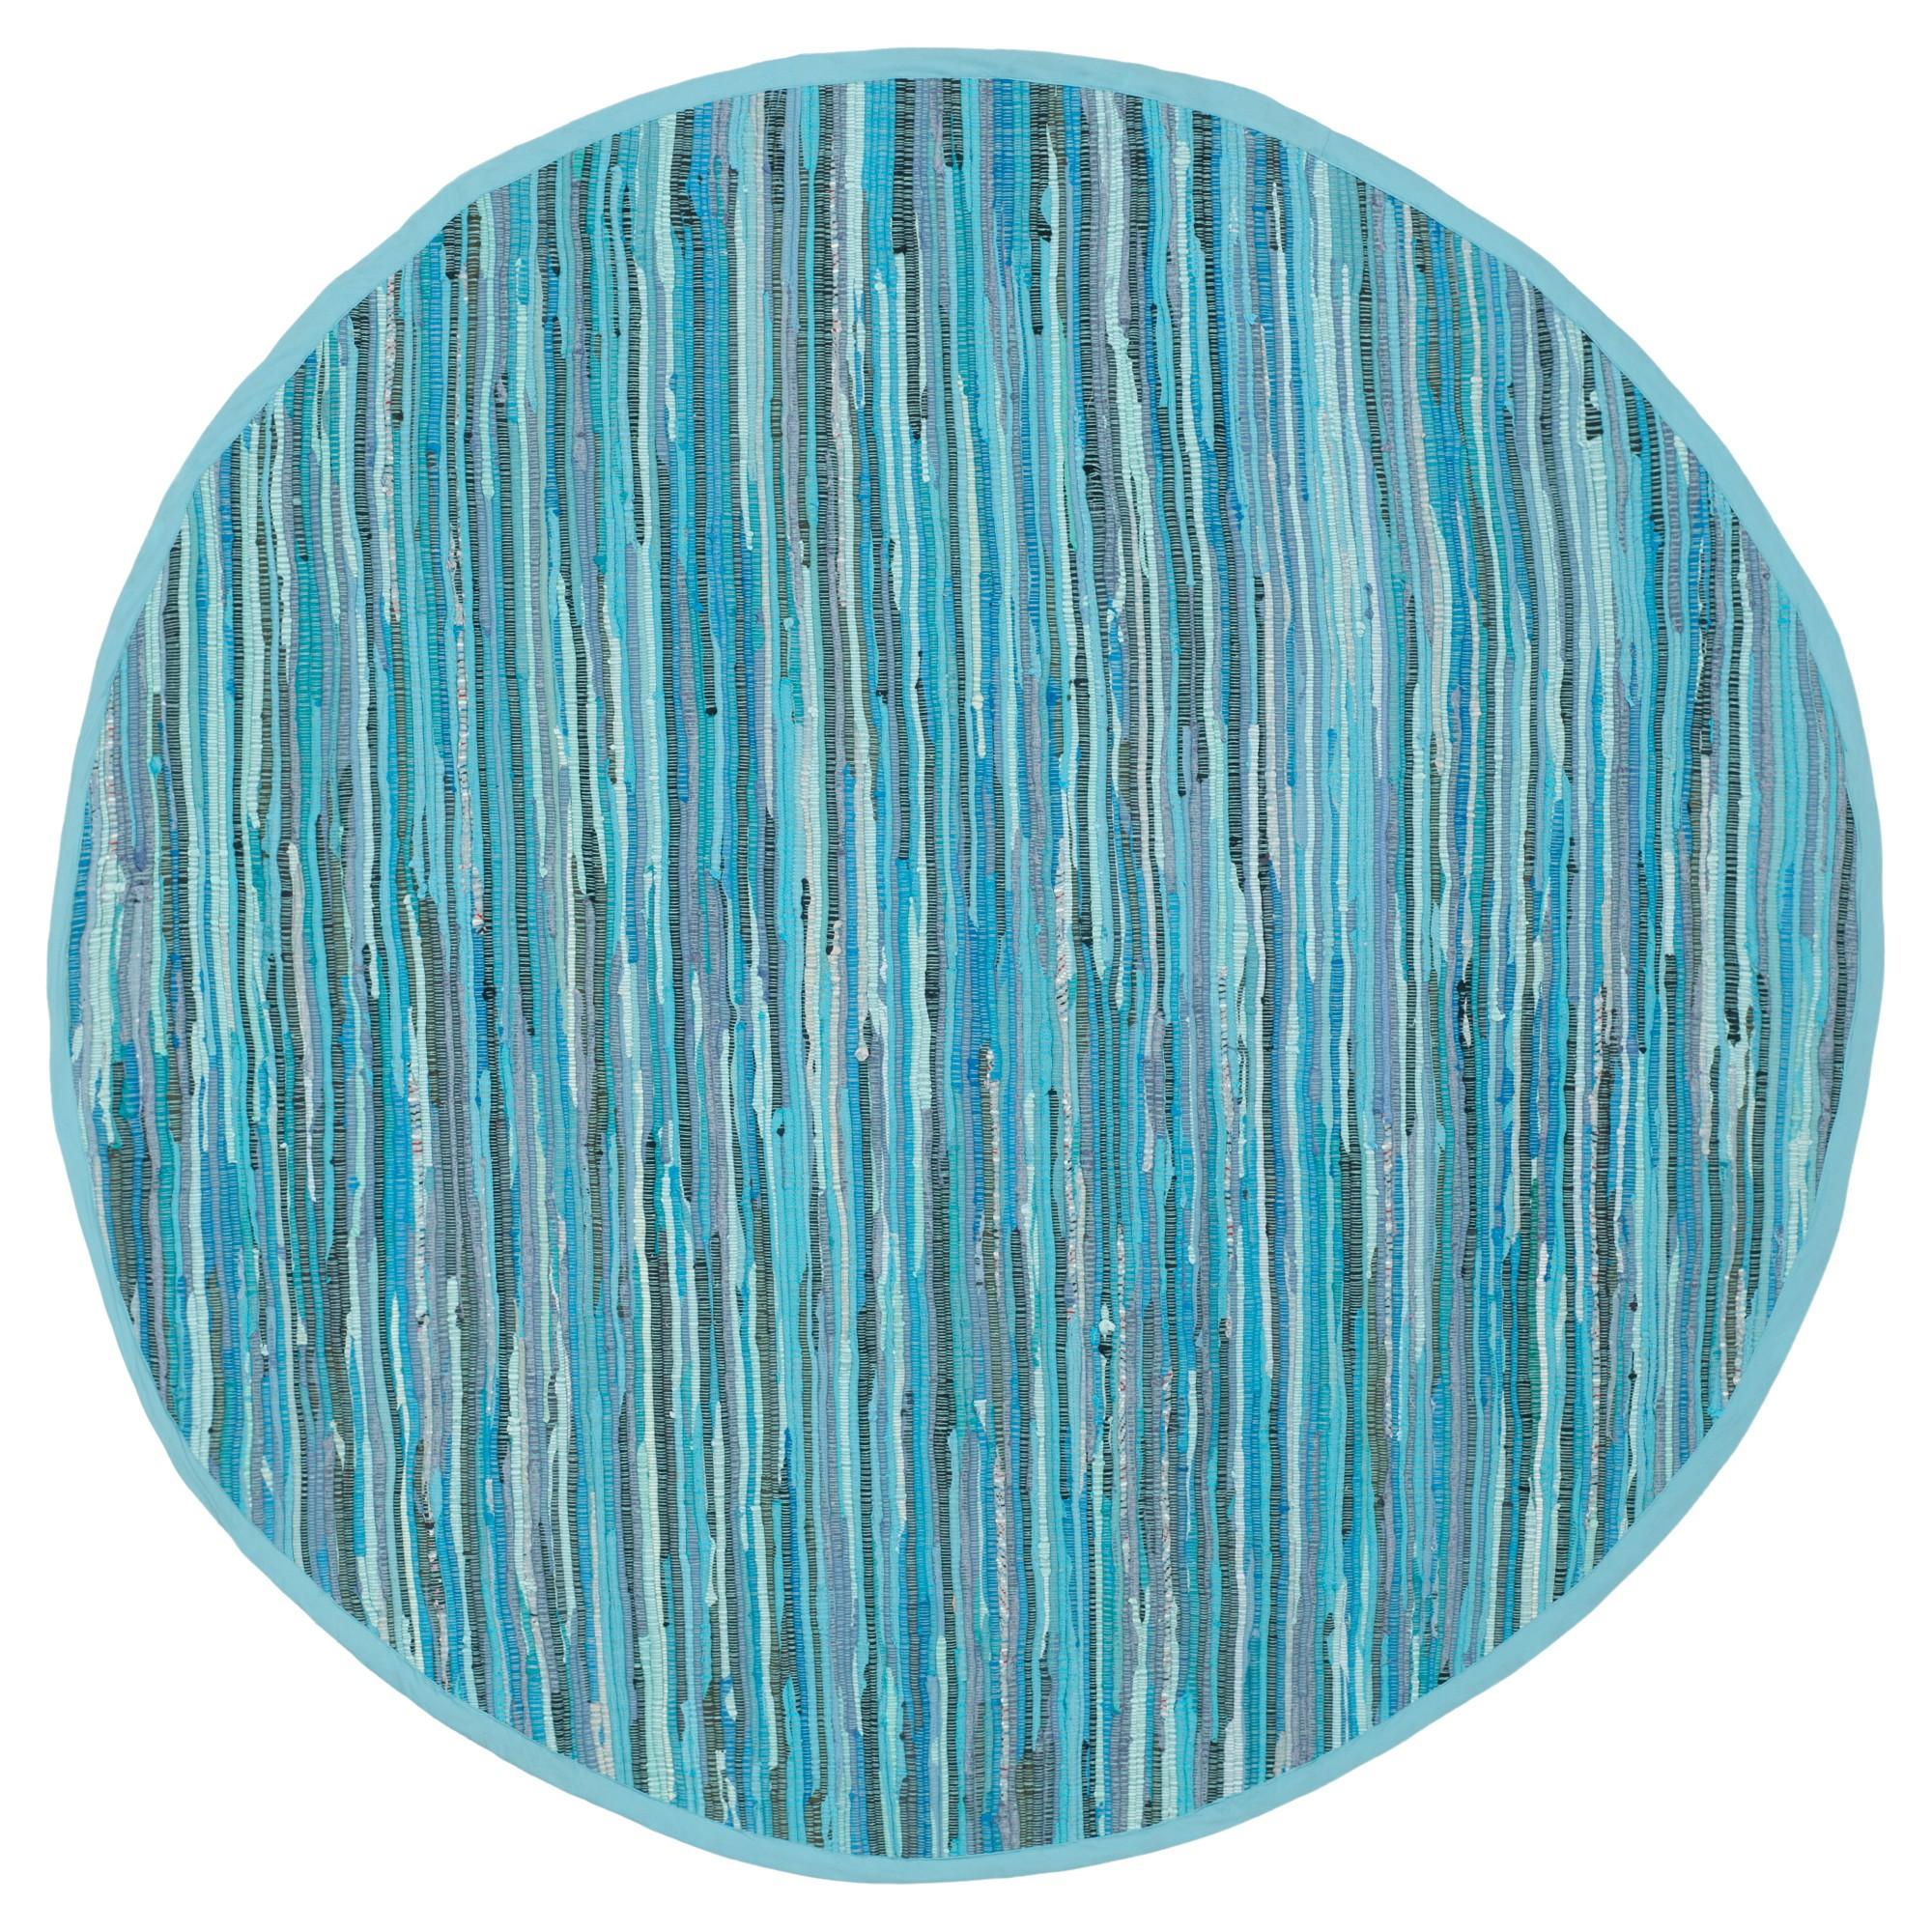 Huddersfield Accent Rug - Blue / Multi (4' Round) - Safavieh